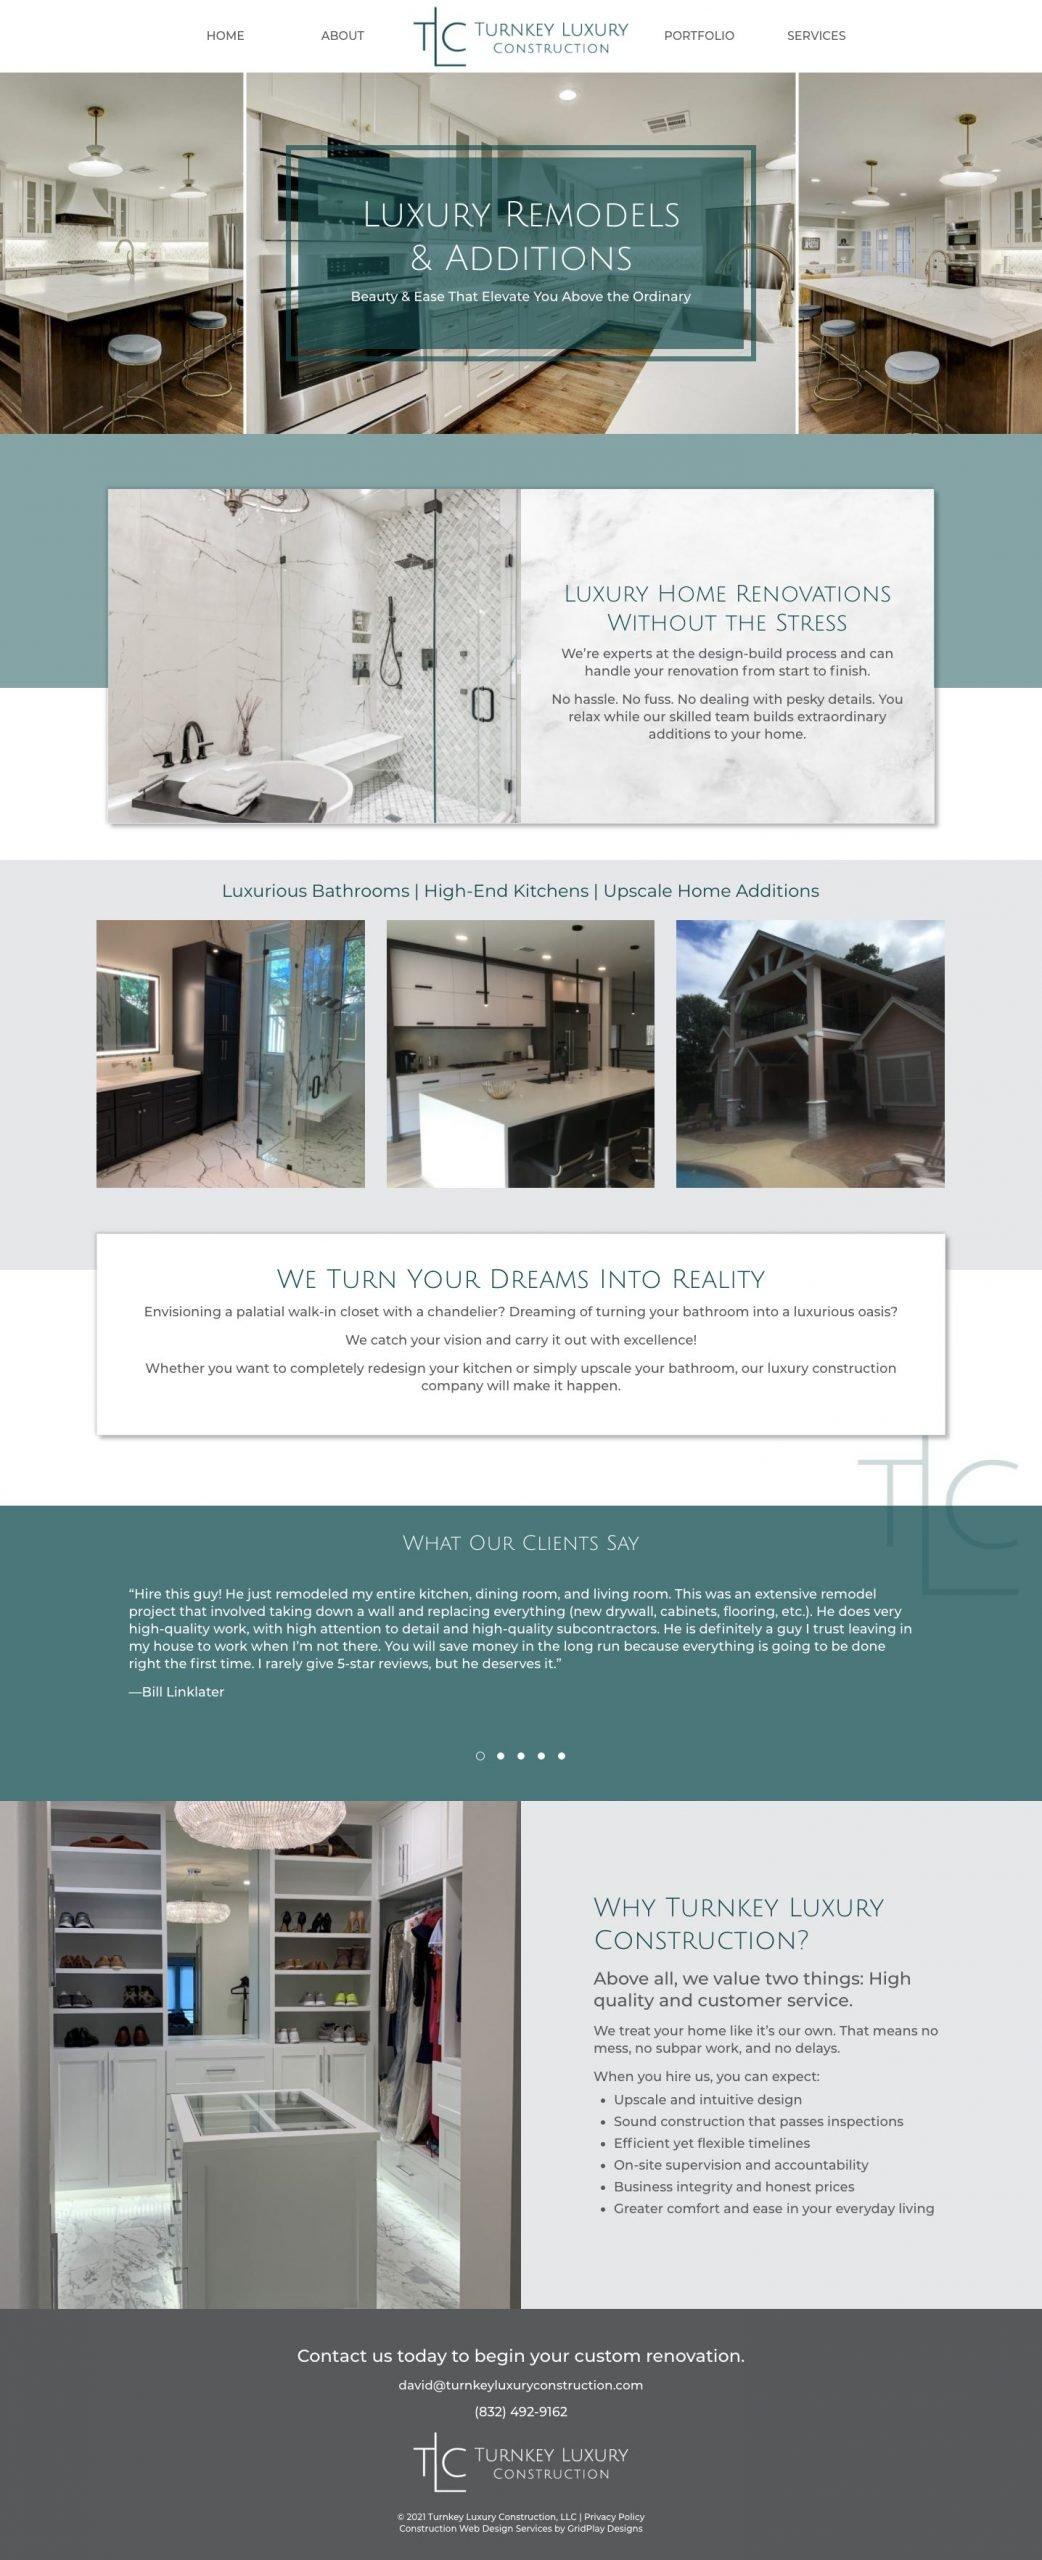 Turnkey Luxury Construction Homepage